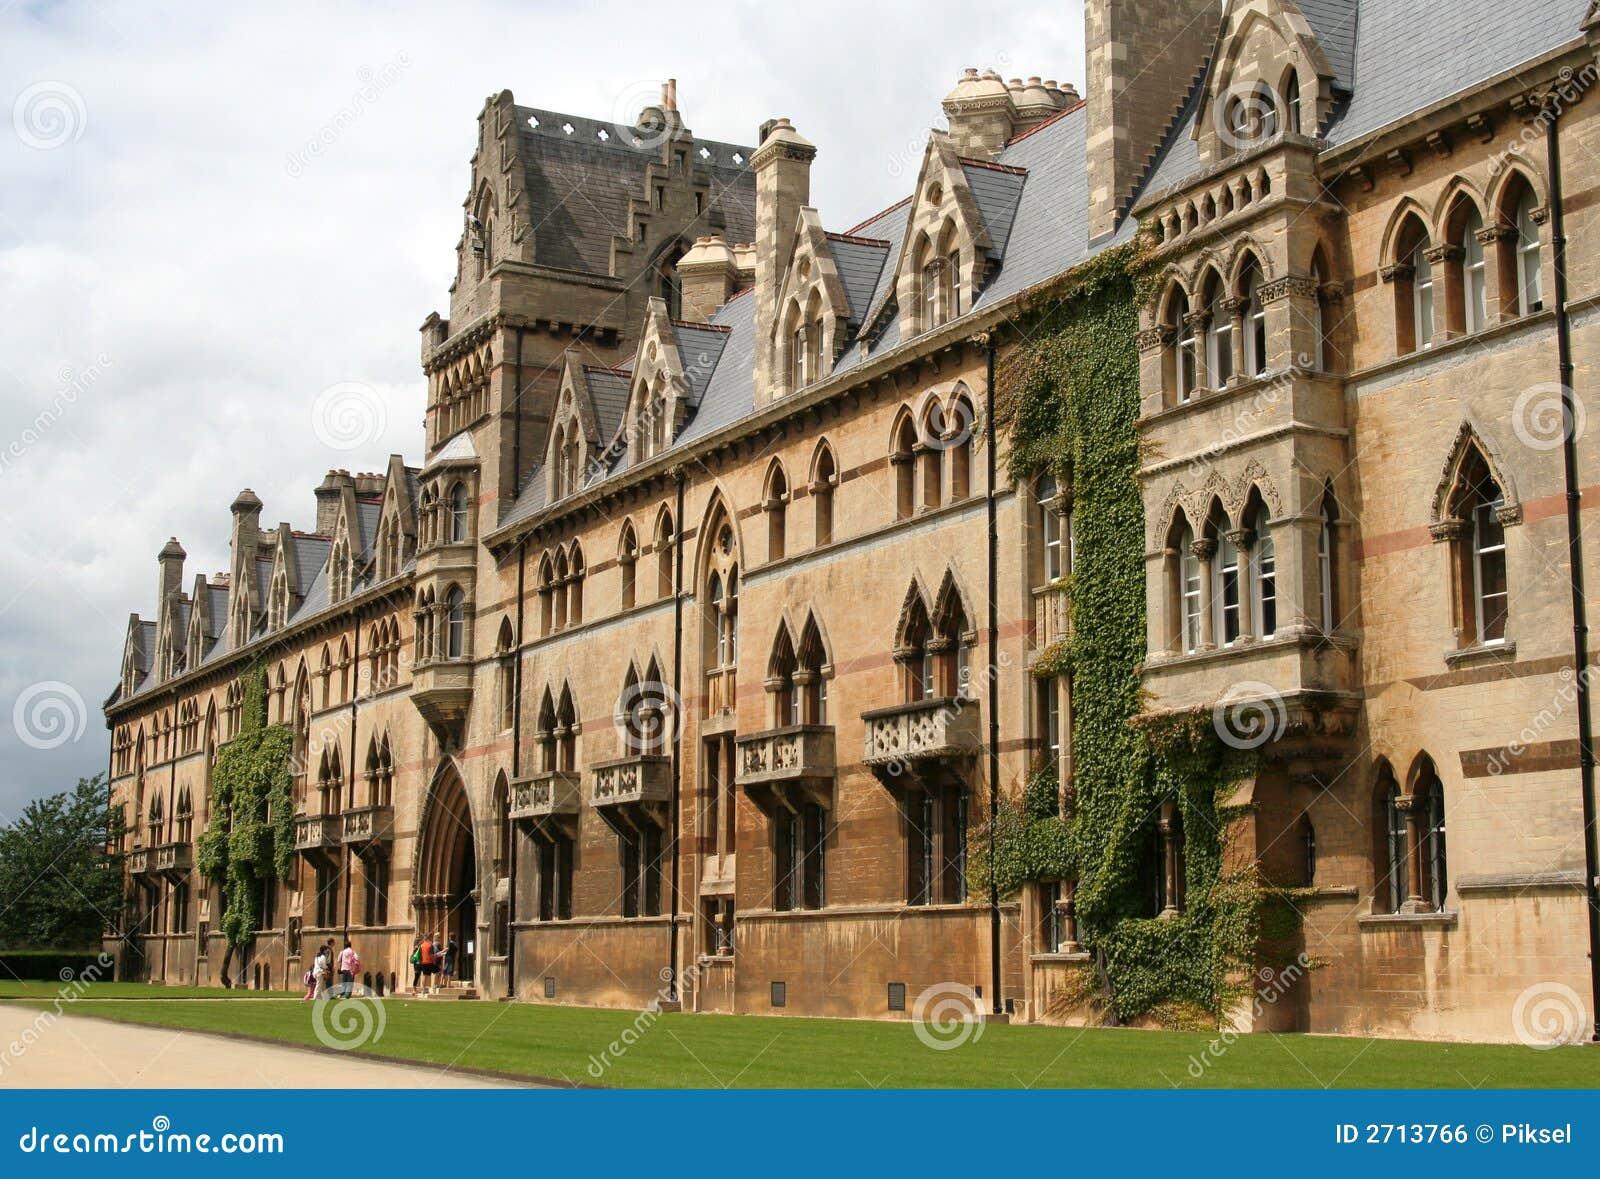 England, Oxford